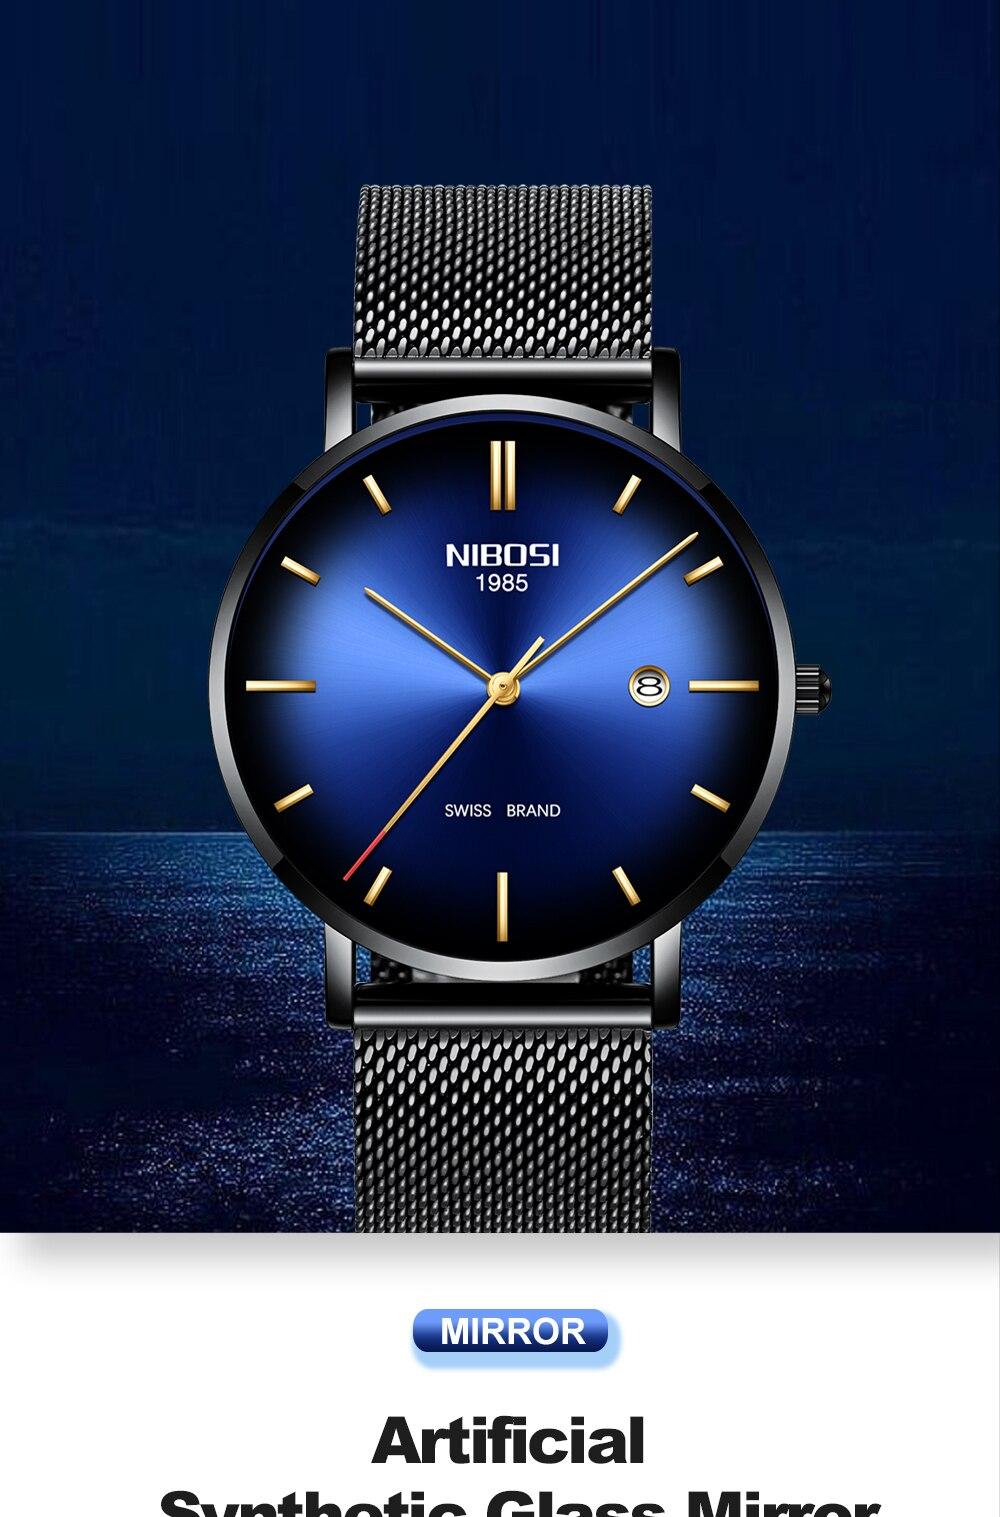 HTB1LD HaEjrK1RkHFNRq6ySvpXaD NIBOSI Watch Men Simple Fashion Swiss Brand Quartz Watch Luxury Creative Waterproof Date Casual Men Watches Relogio Masculino